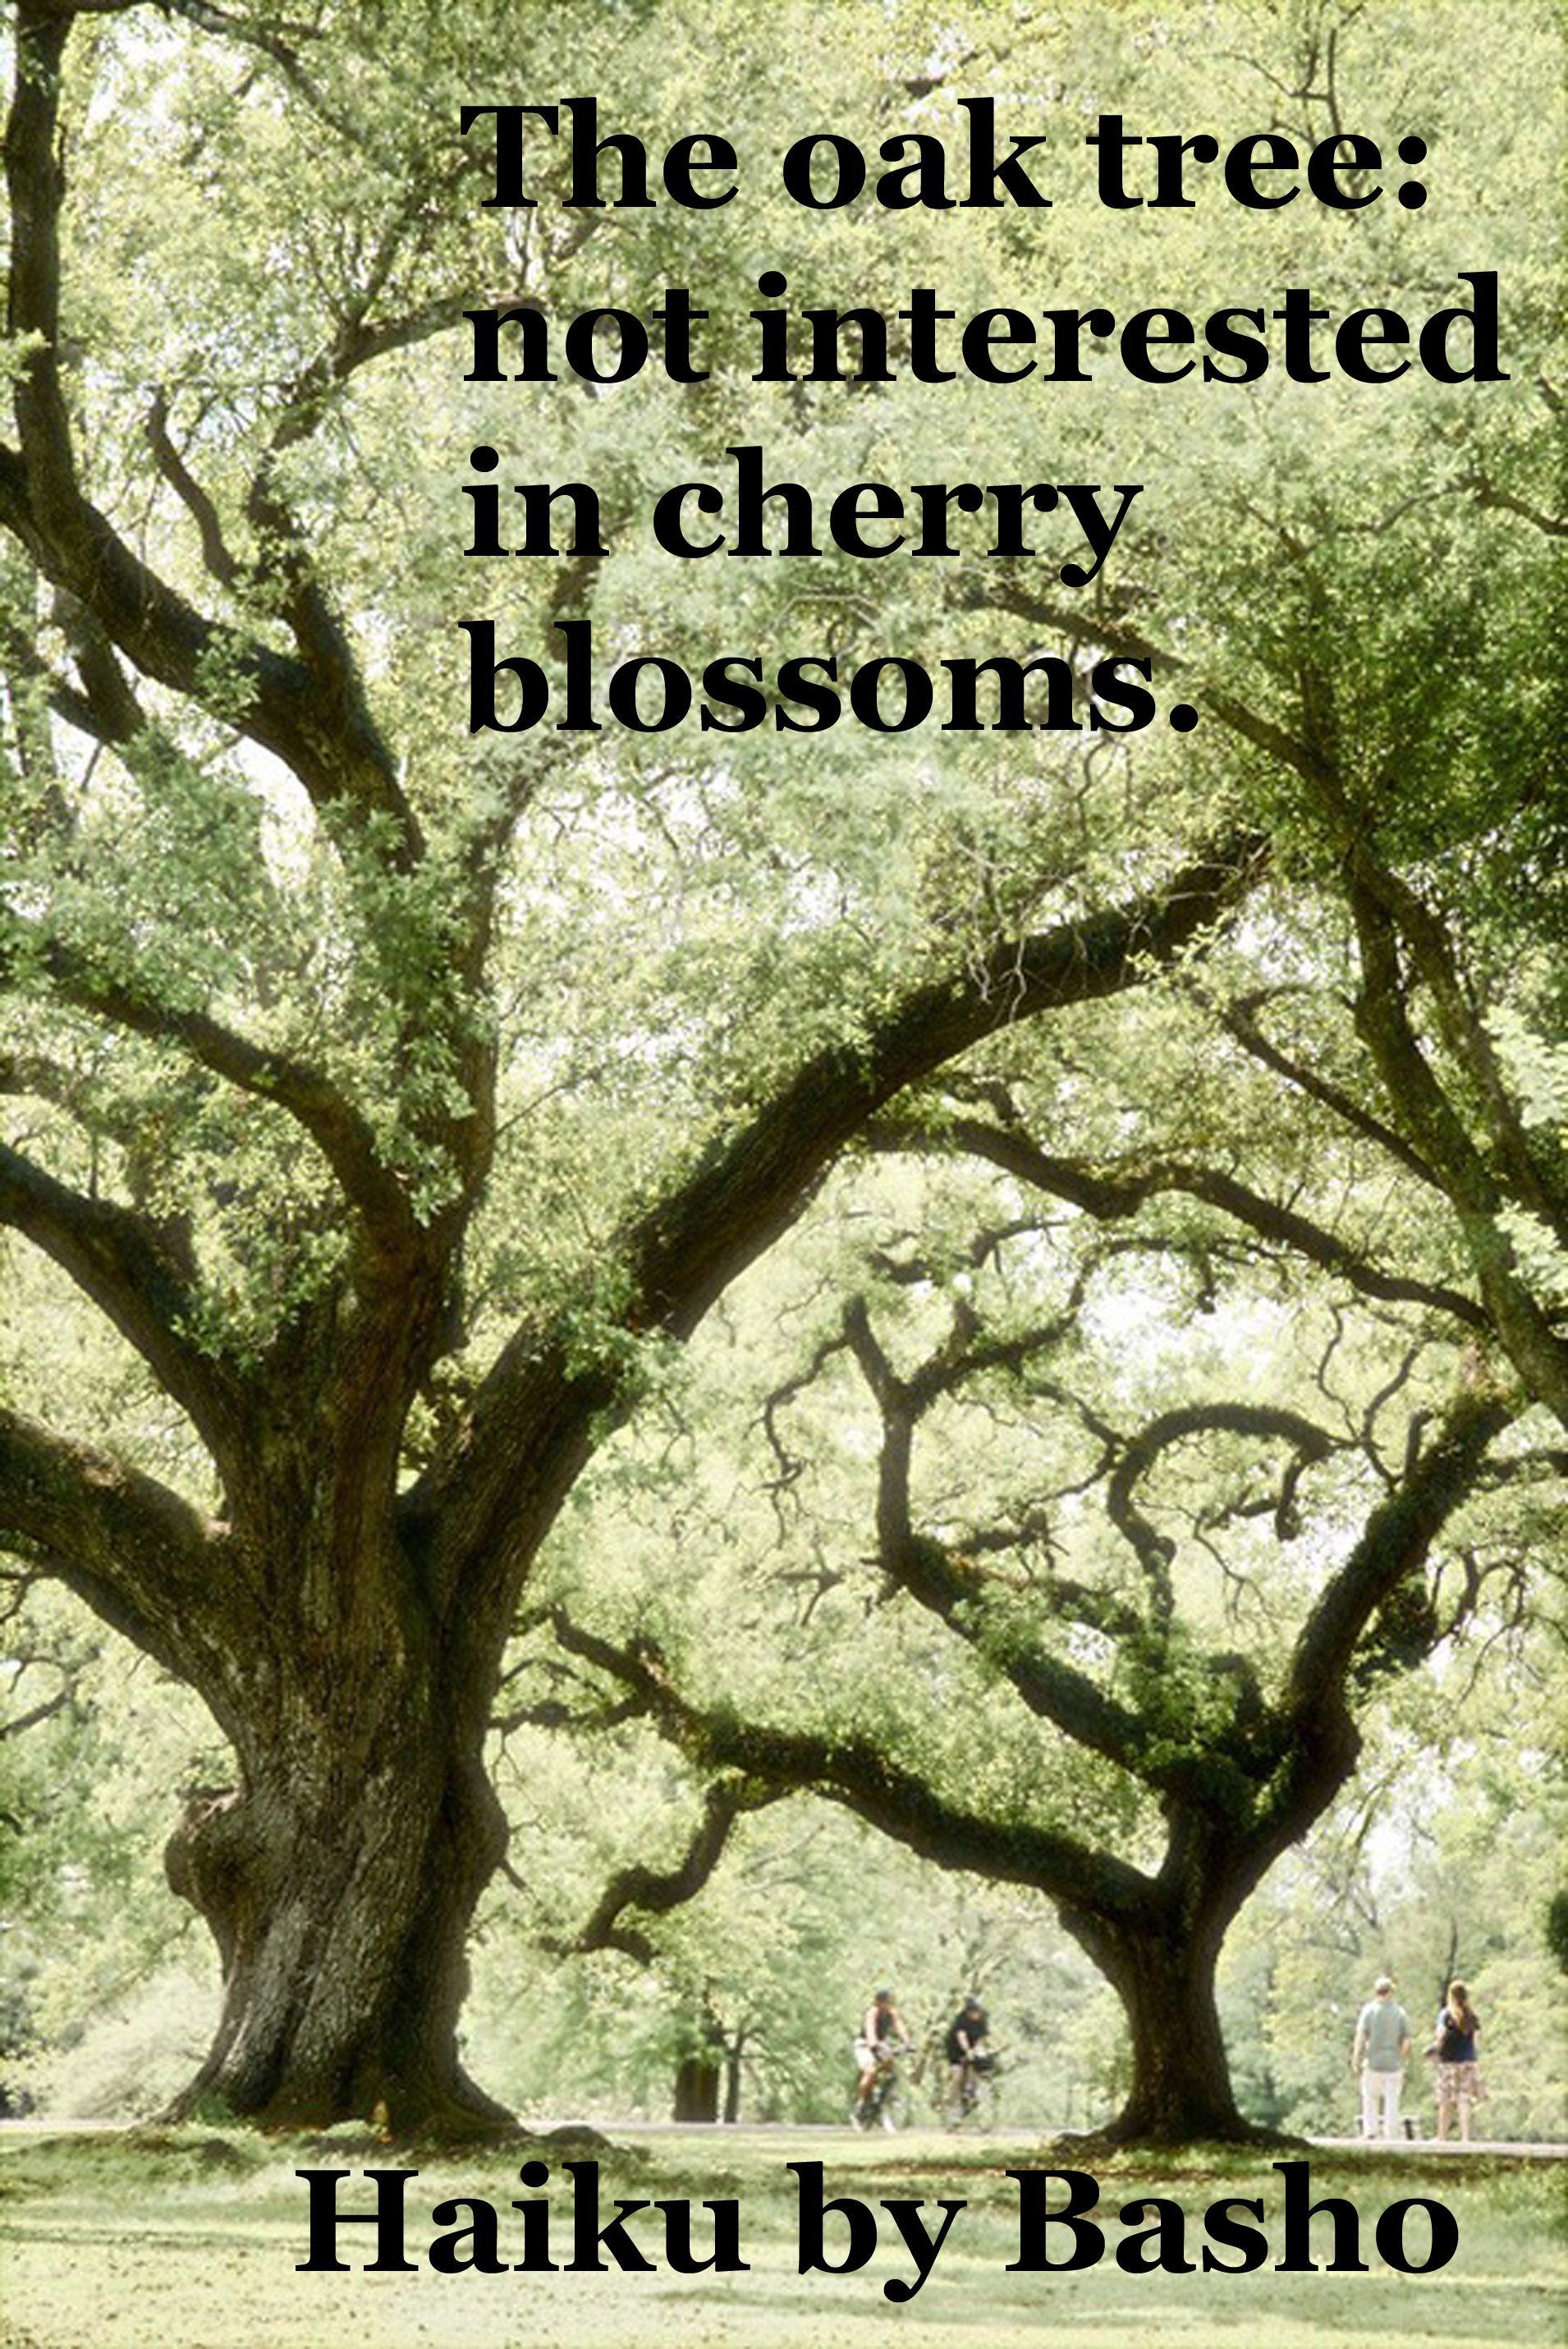 The Oak Tree Not Interested In Cherry Blossoms Haiku By Basho Arboles Arboles Y Arbustos Hermosos Paisajes